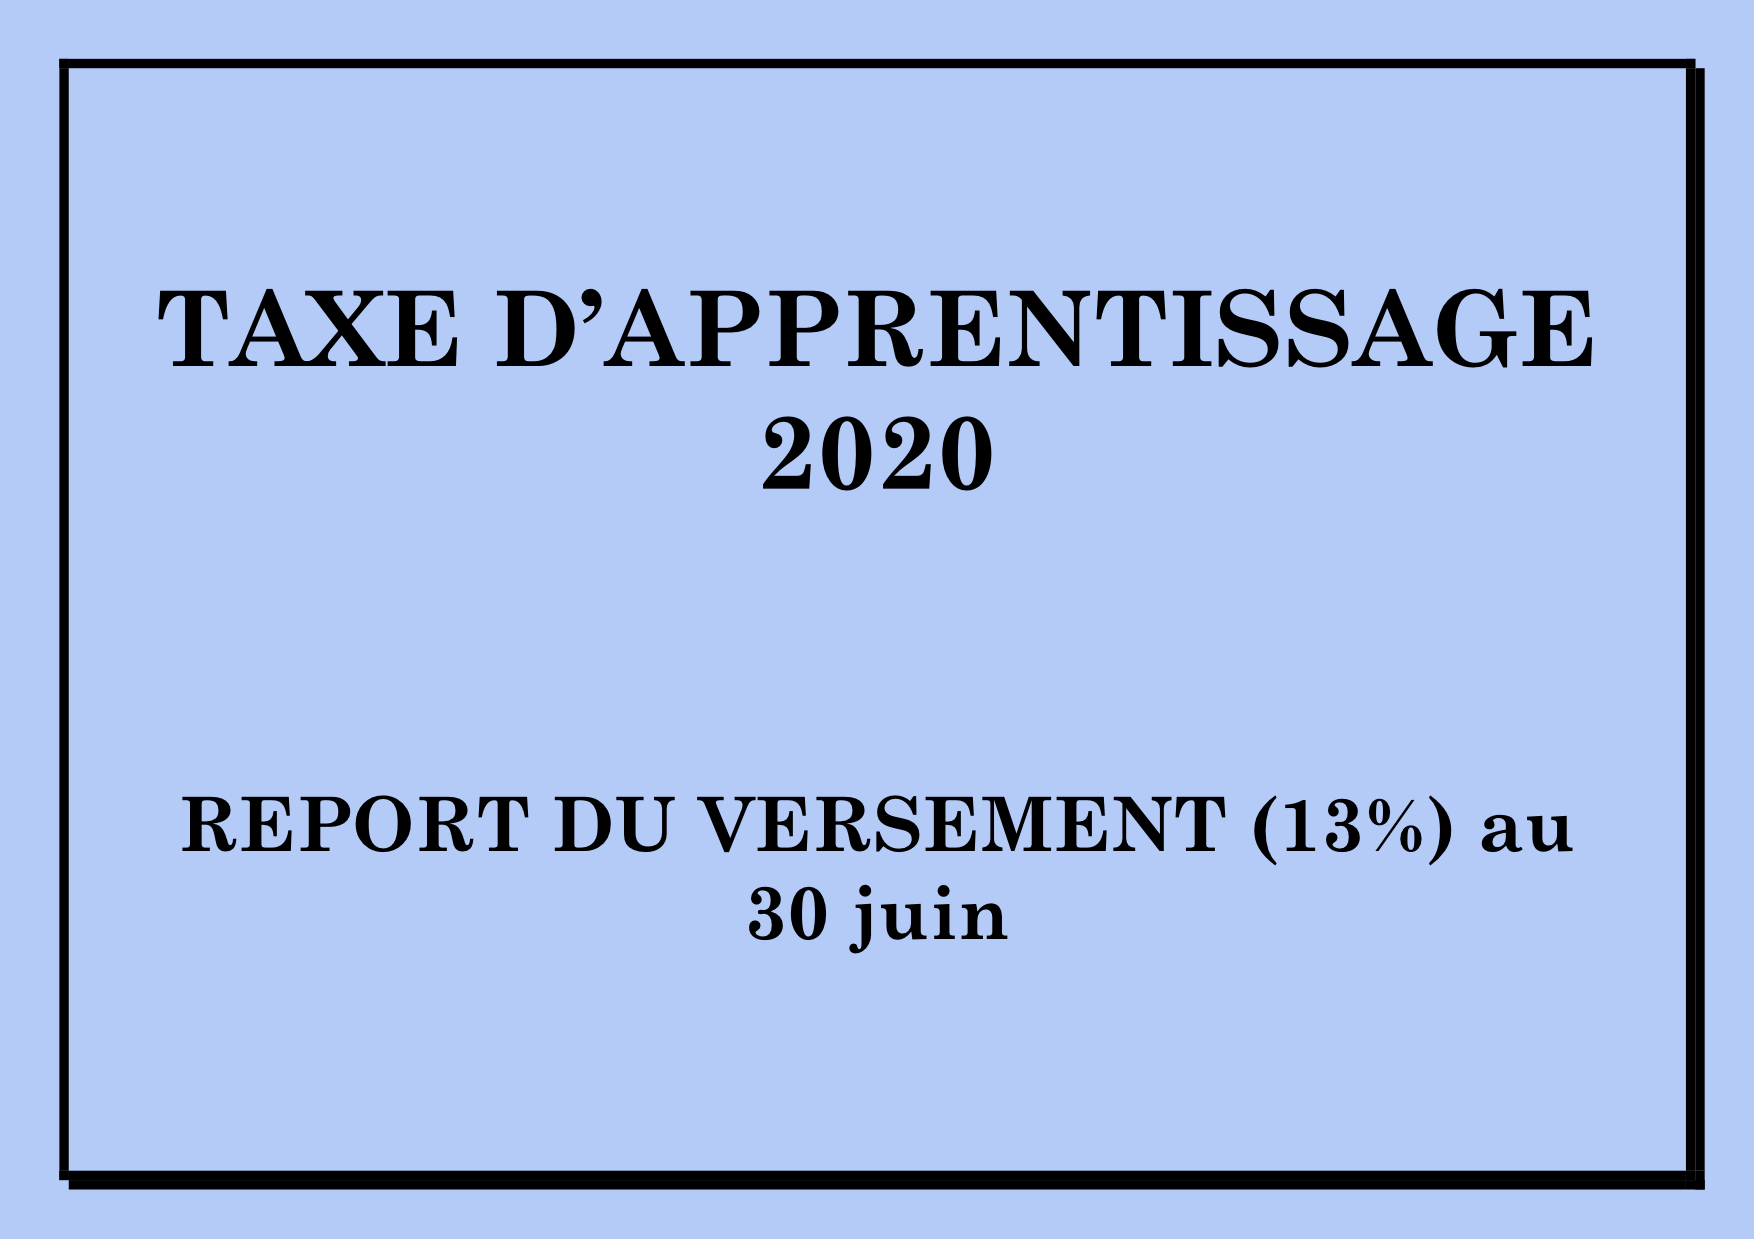 TAXE D'APPRENTISSAGE 2020.jpg